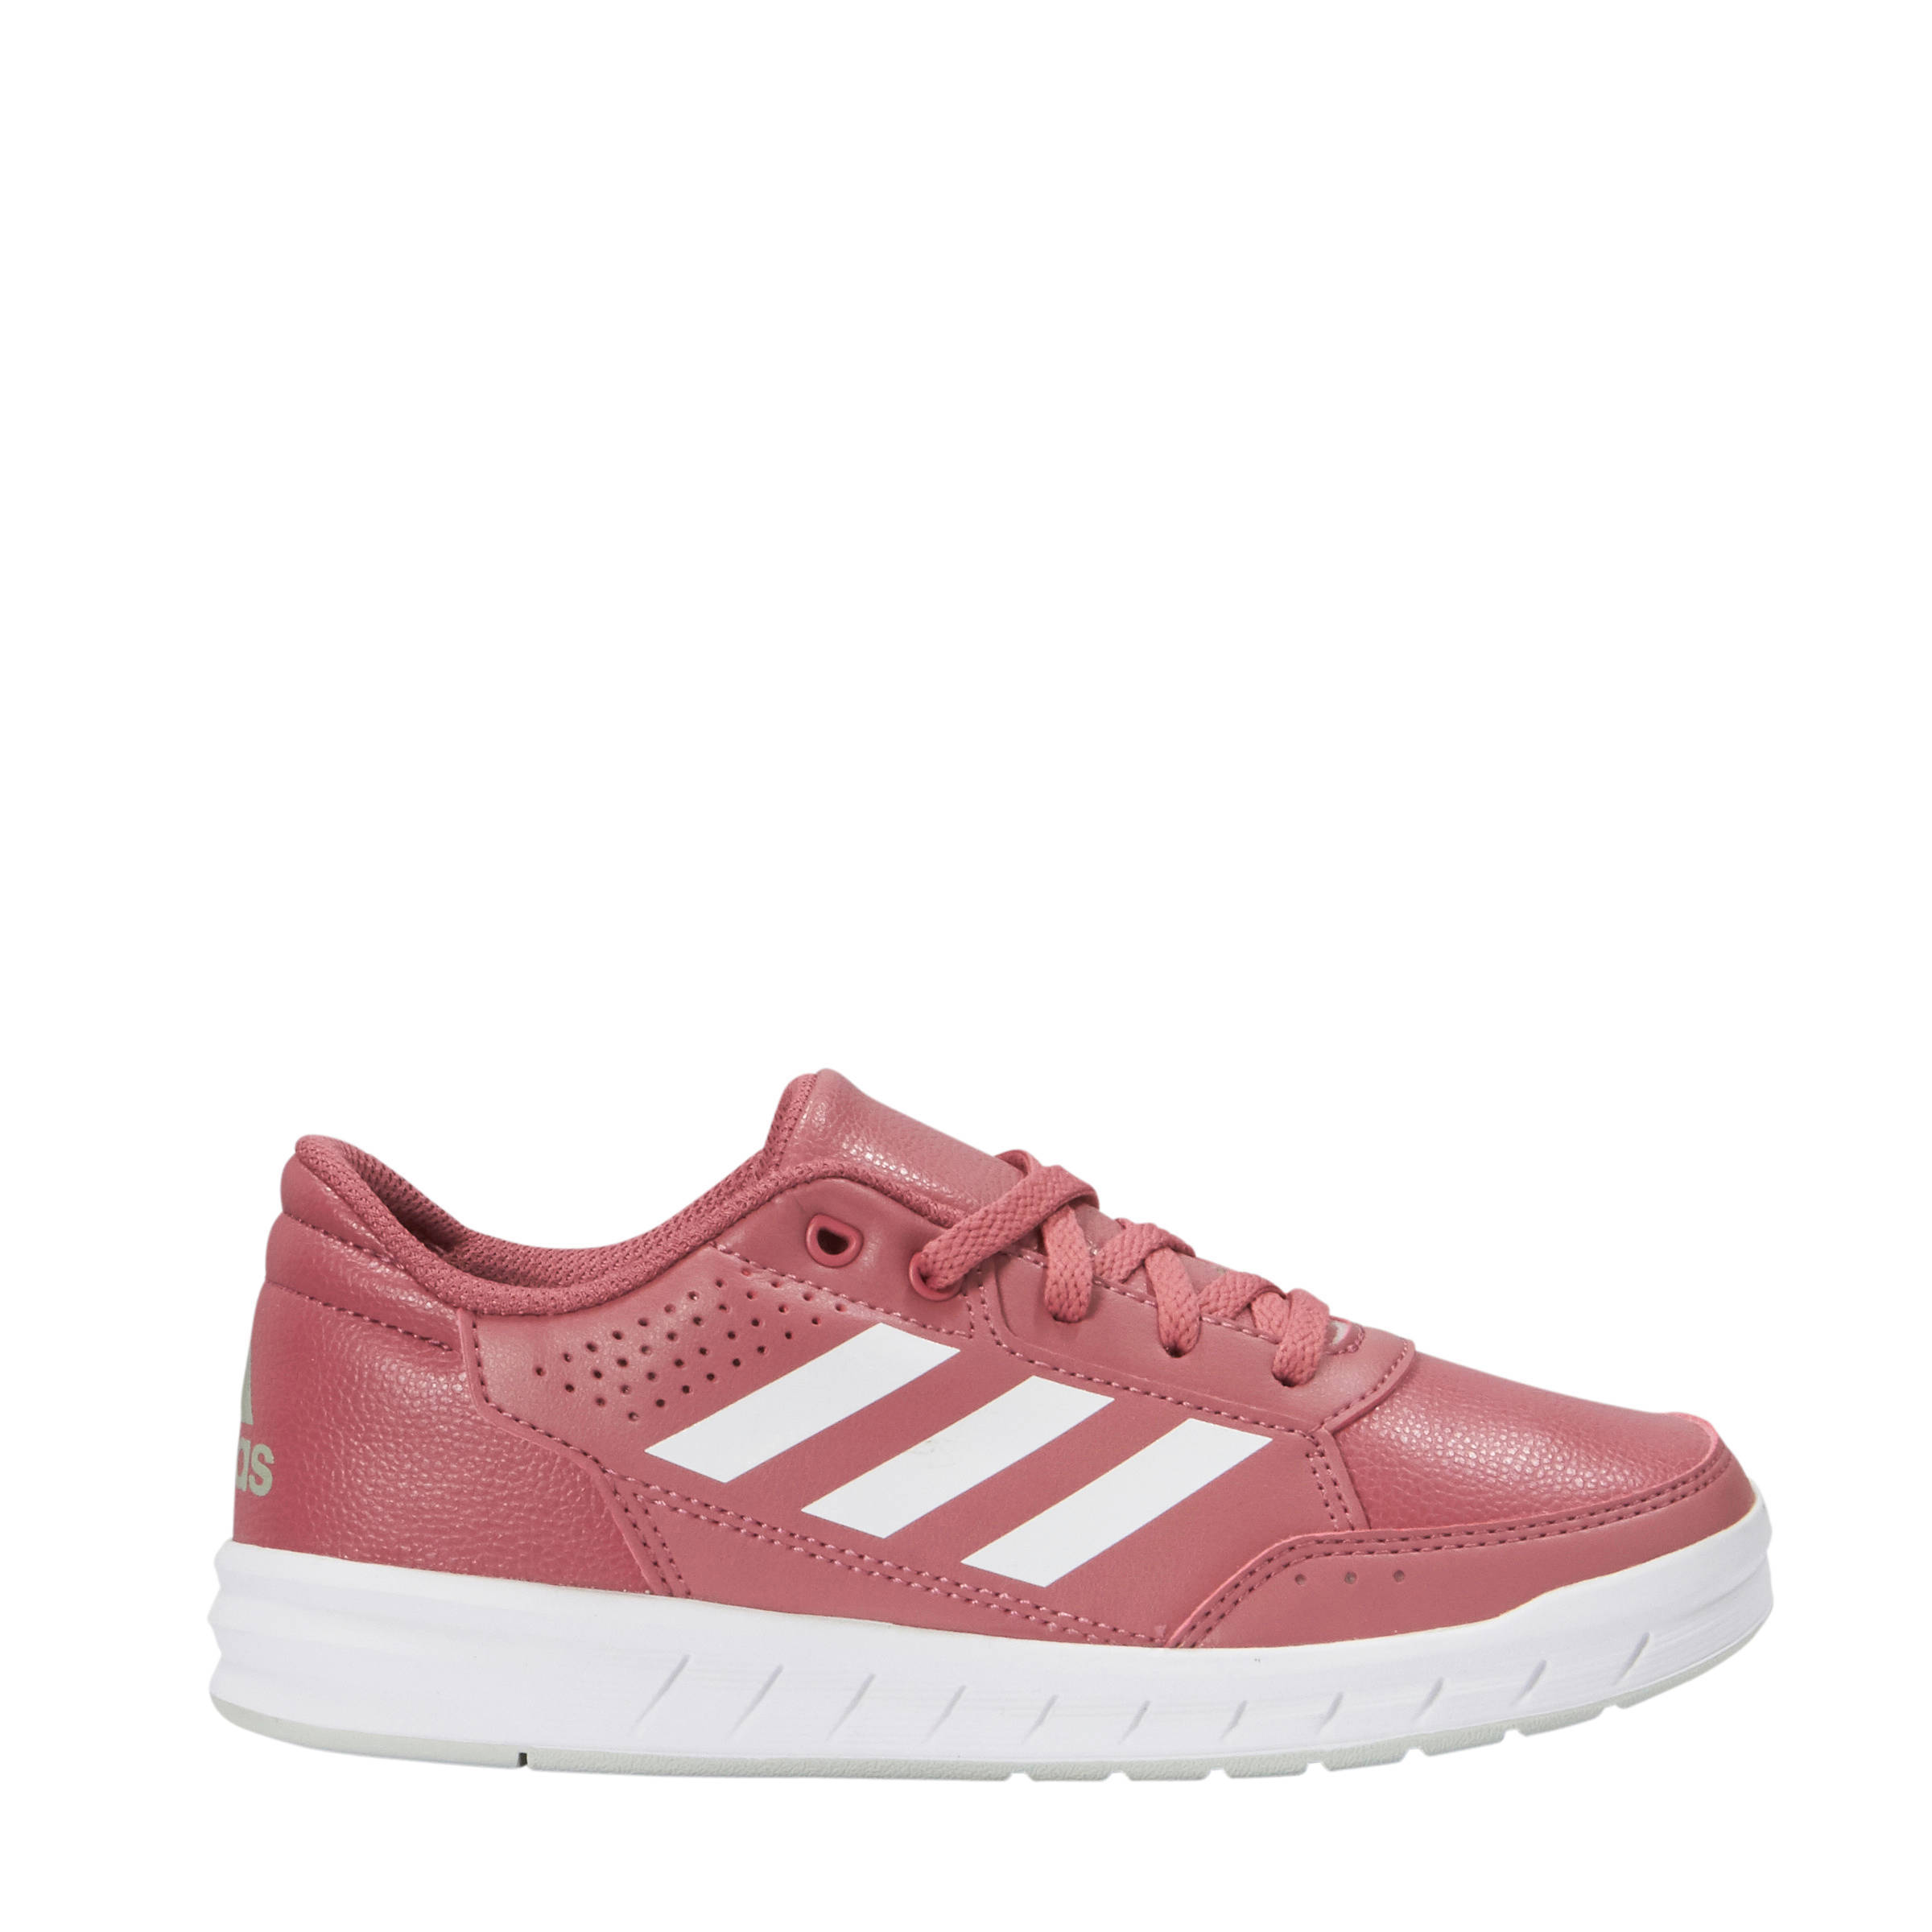 adidas sportschoenen roze